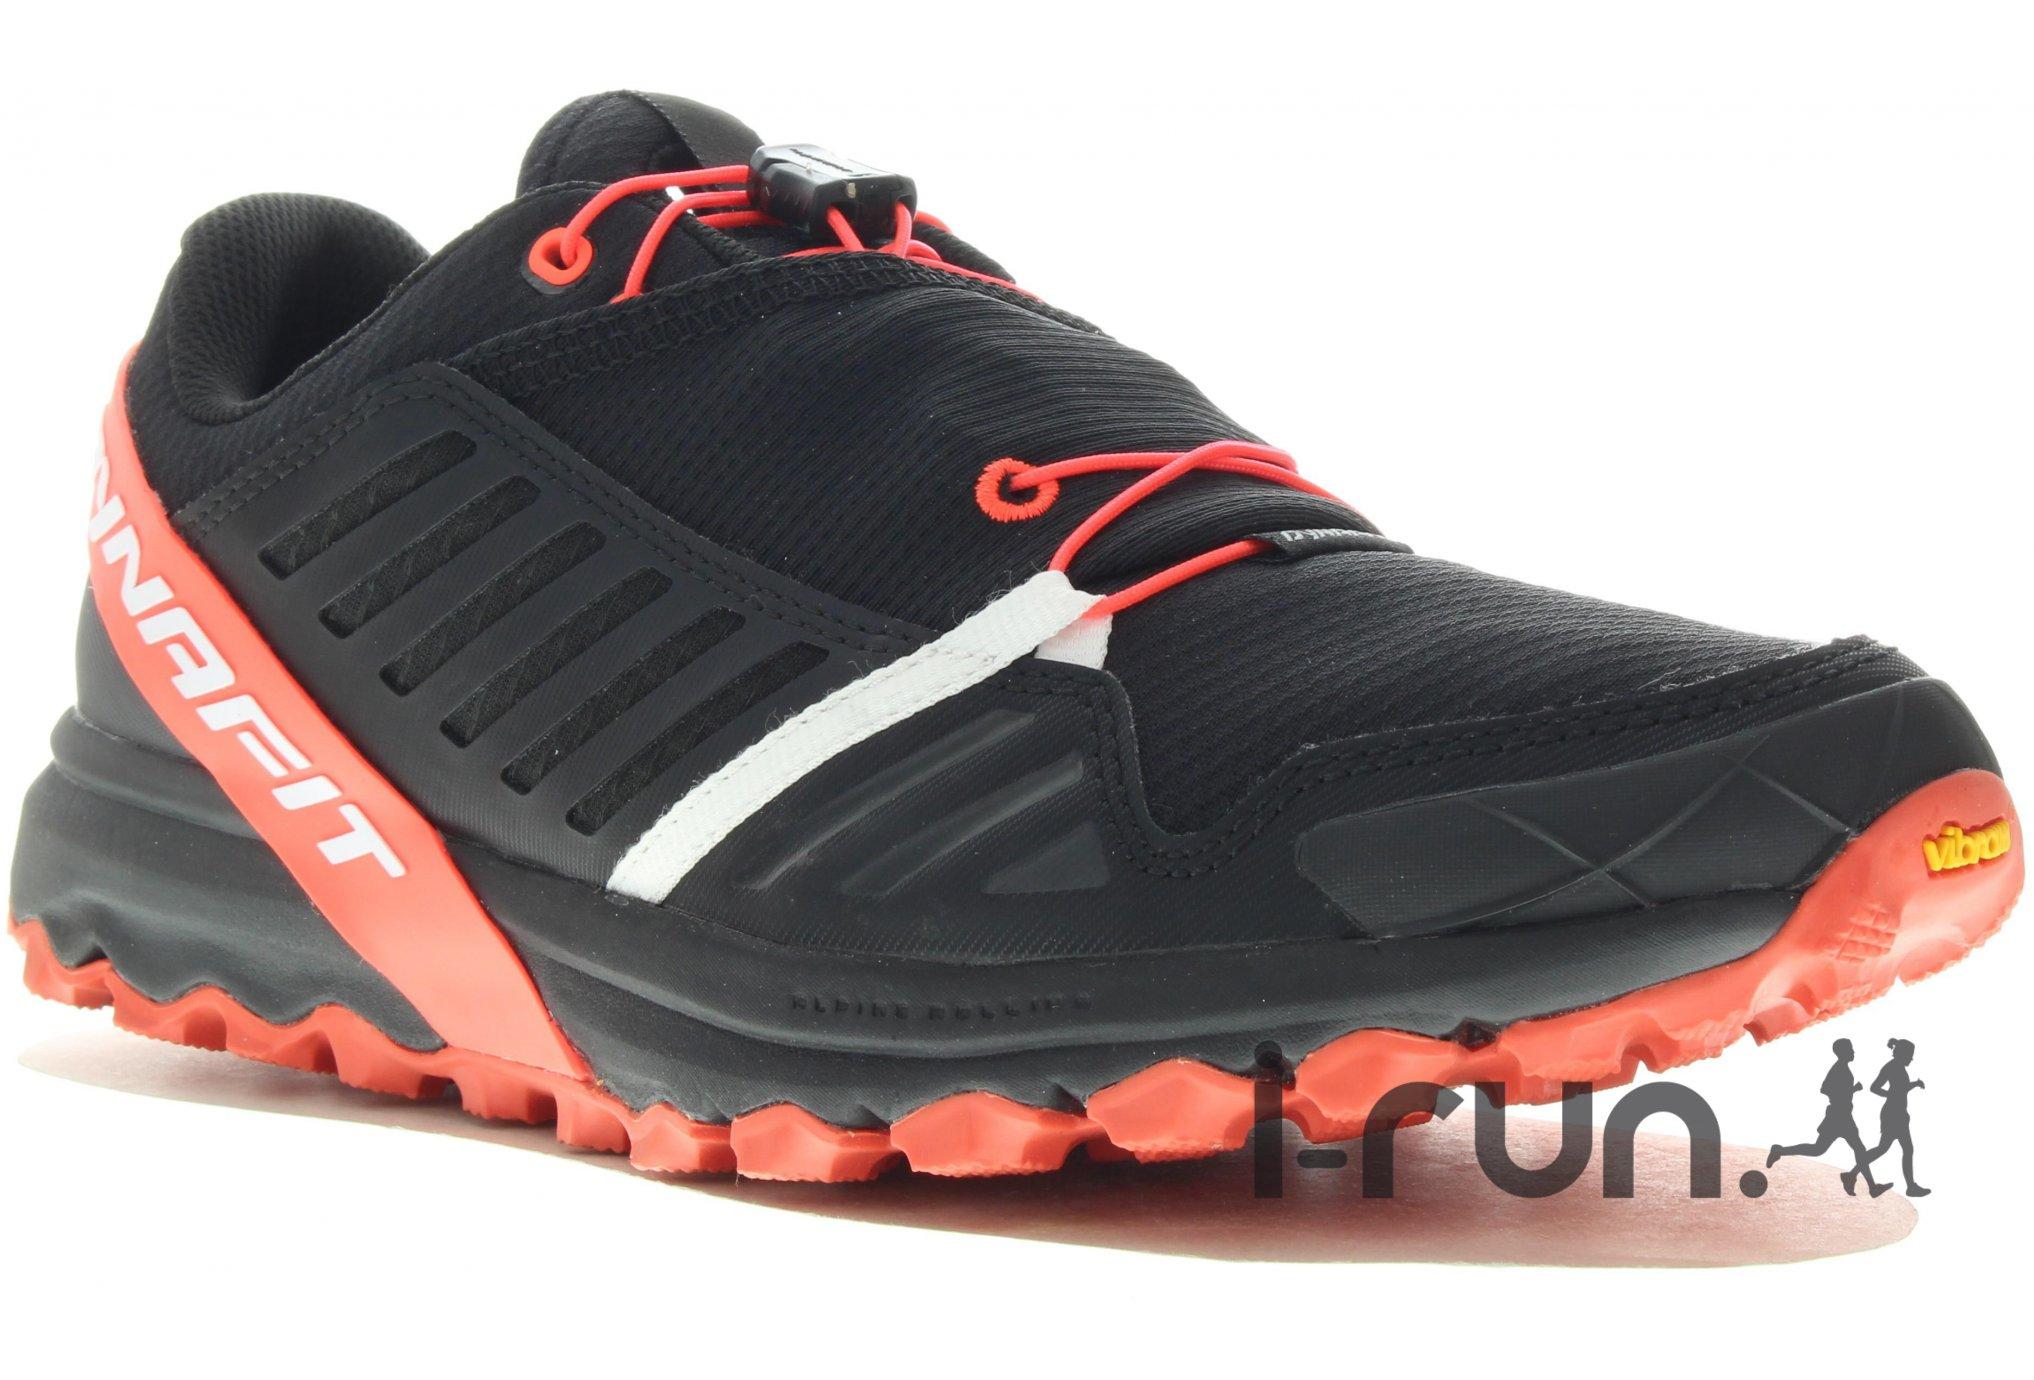 mont 39 run dynafit alpine pro w chaussures running femme. Black Bedroom Furniture Sets. Home Design Ideas